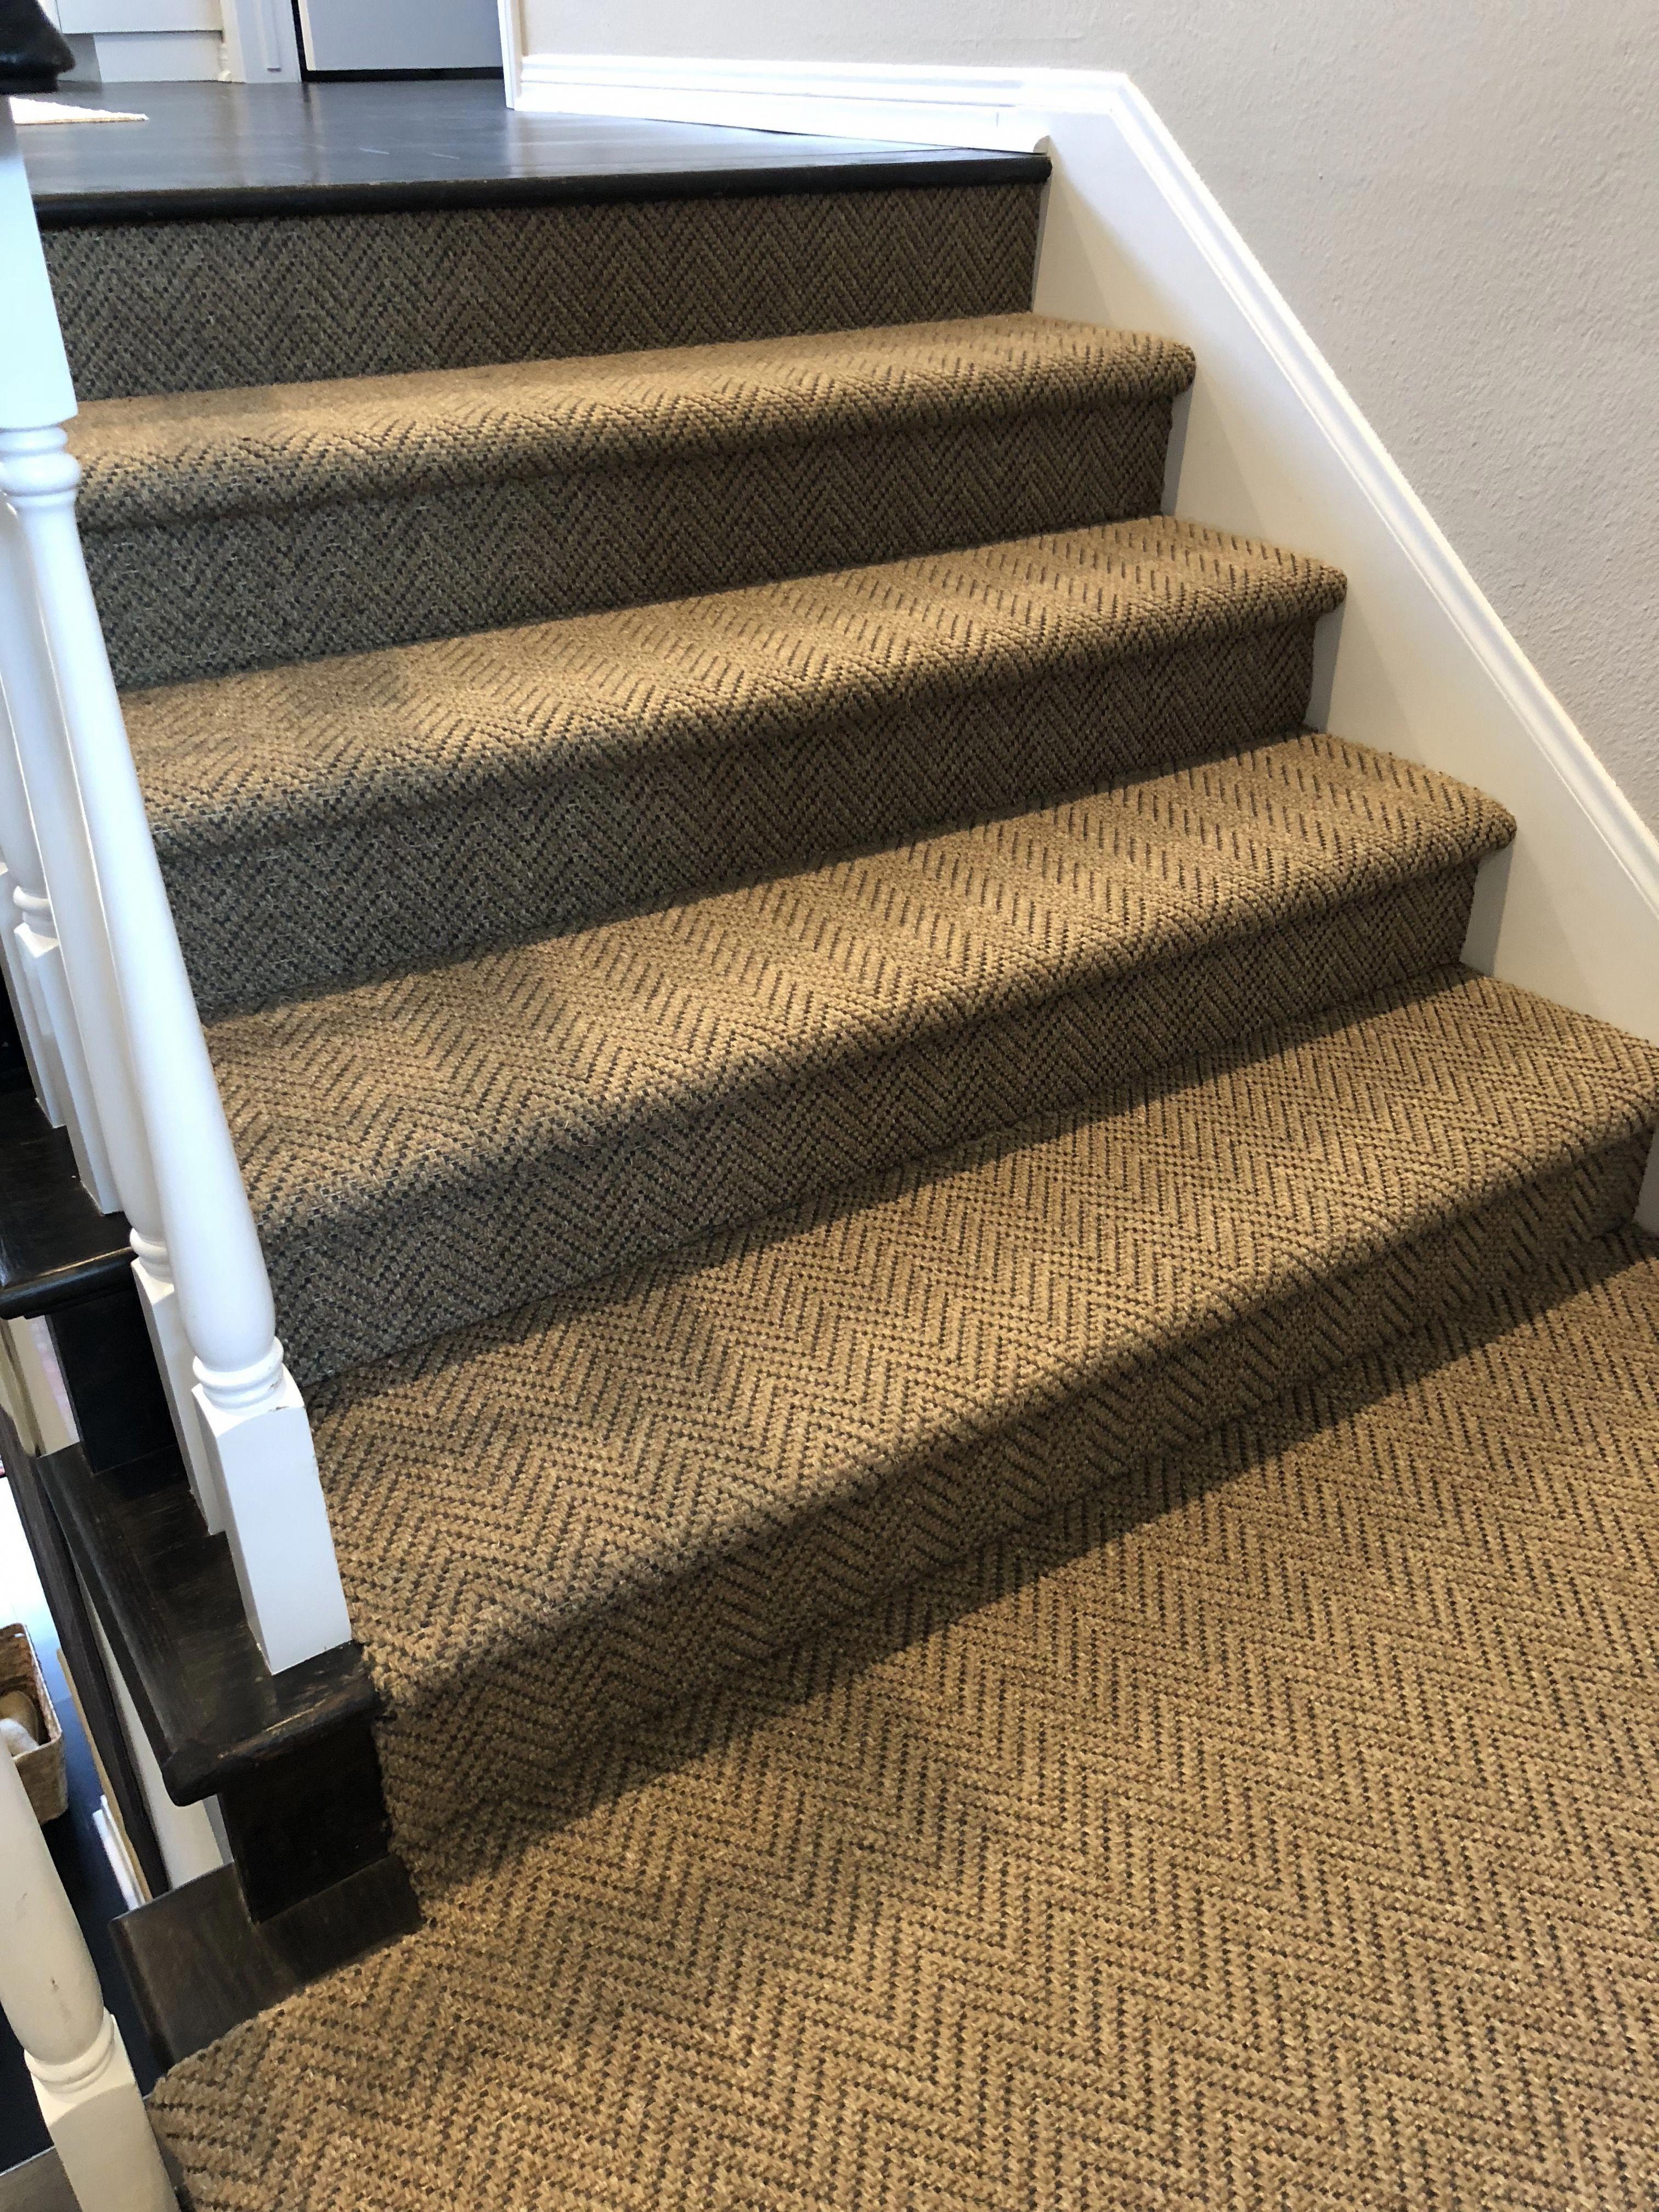 Herringbone Pattern Stair Runner Stair Runner Carpet Carpet Runner Stair Runner